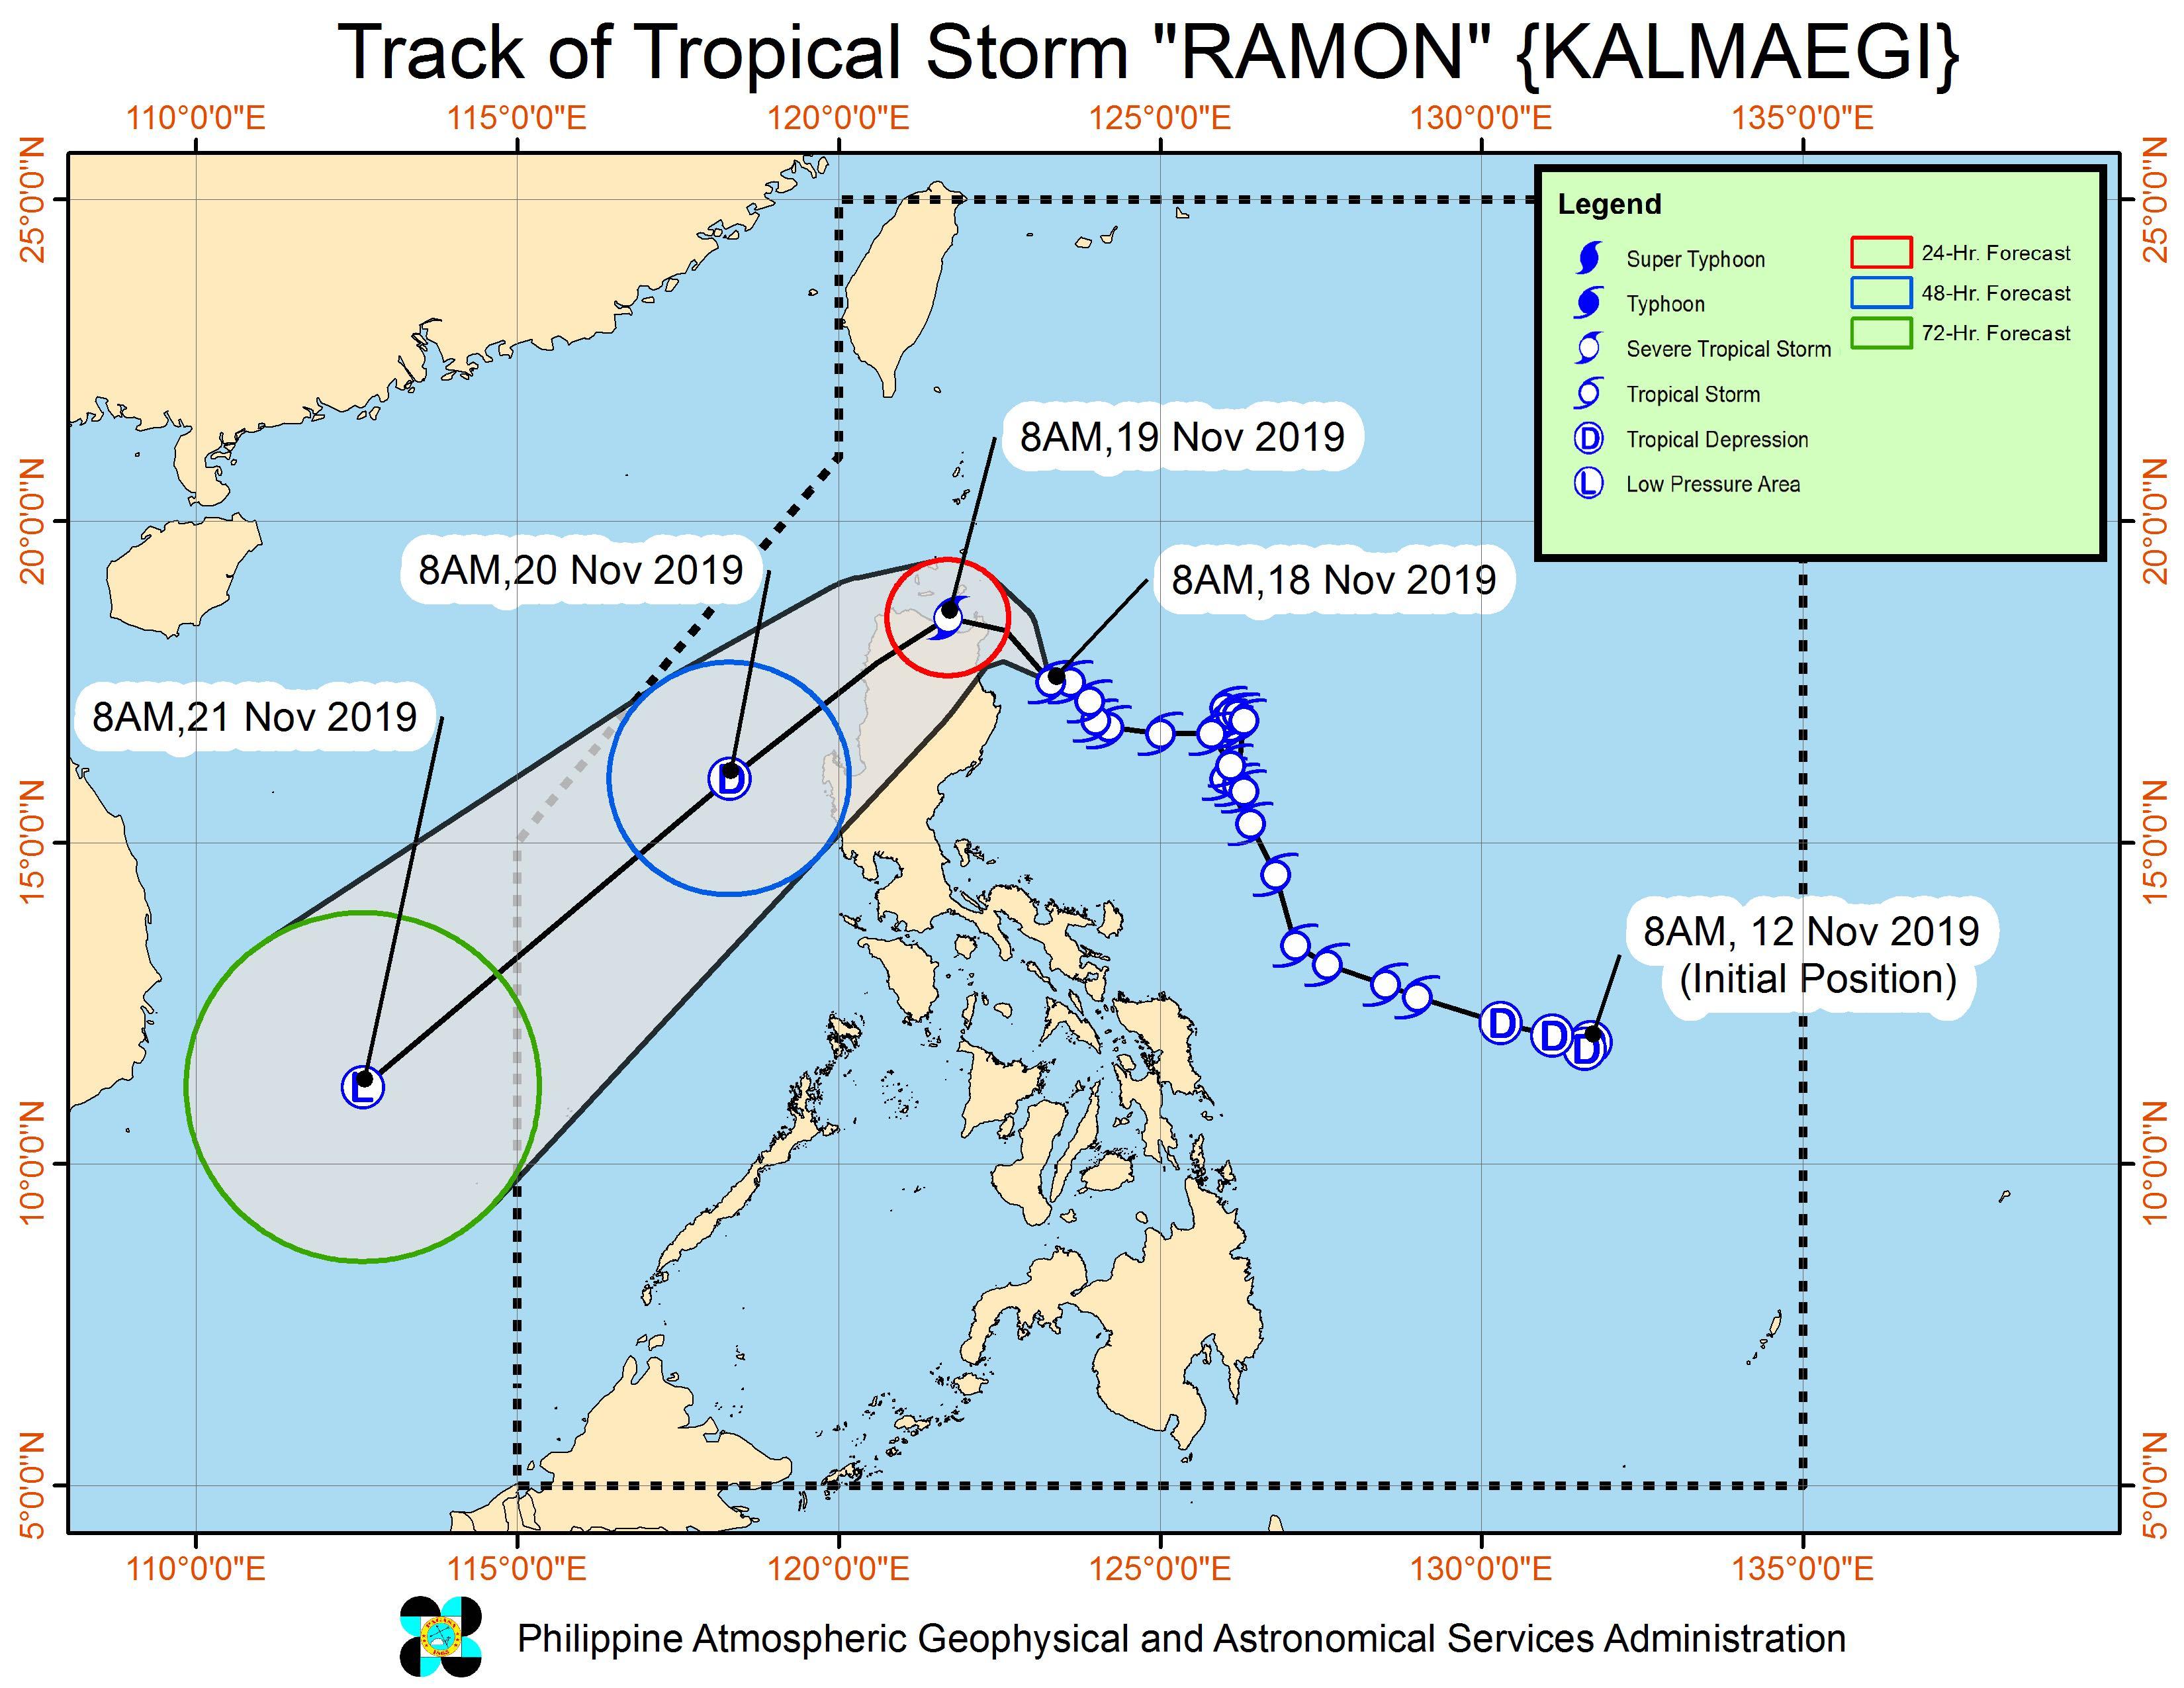 Forecast track of Tropical Storm Ramon (Kalmaegi) as of November 18, 2019, 11 am. Image from PAGASA